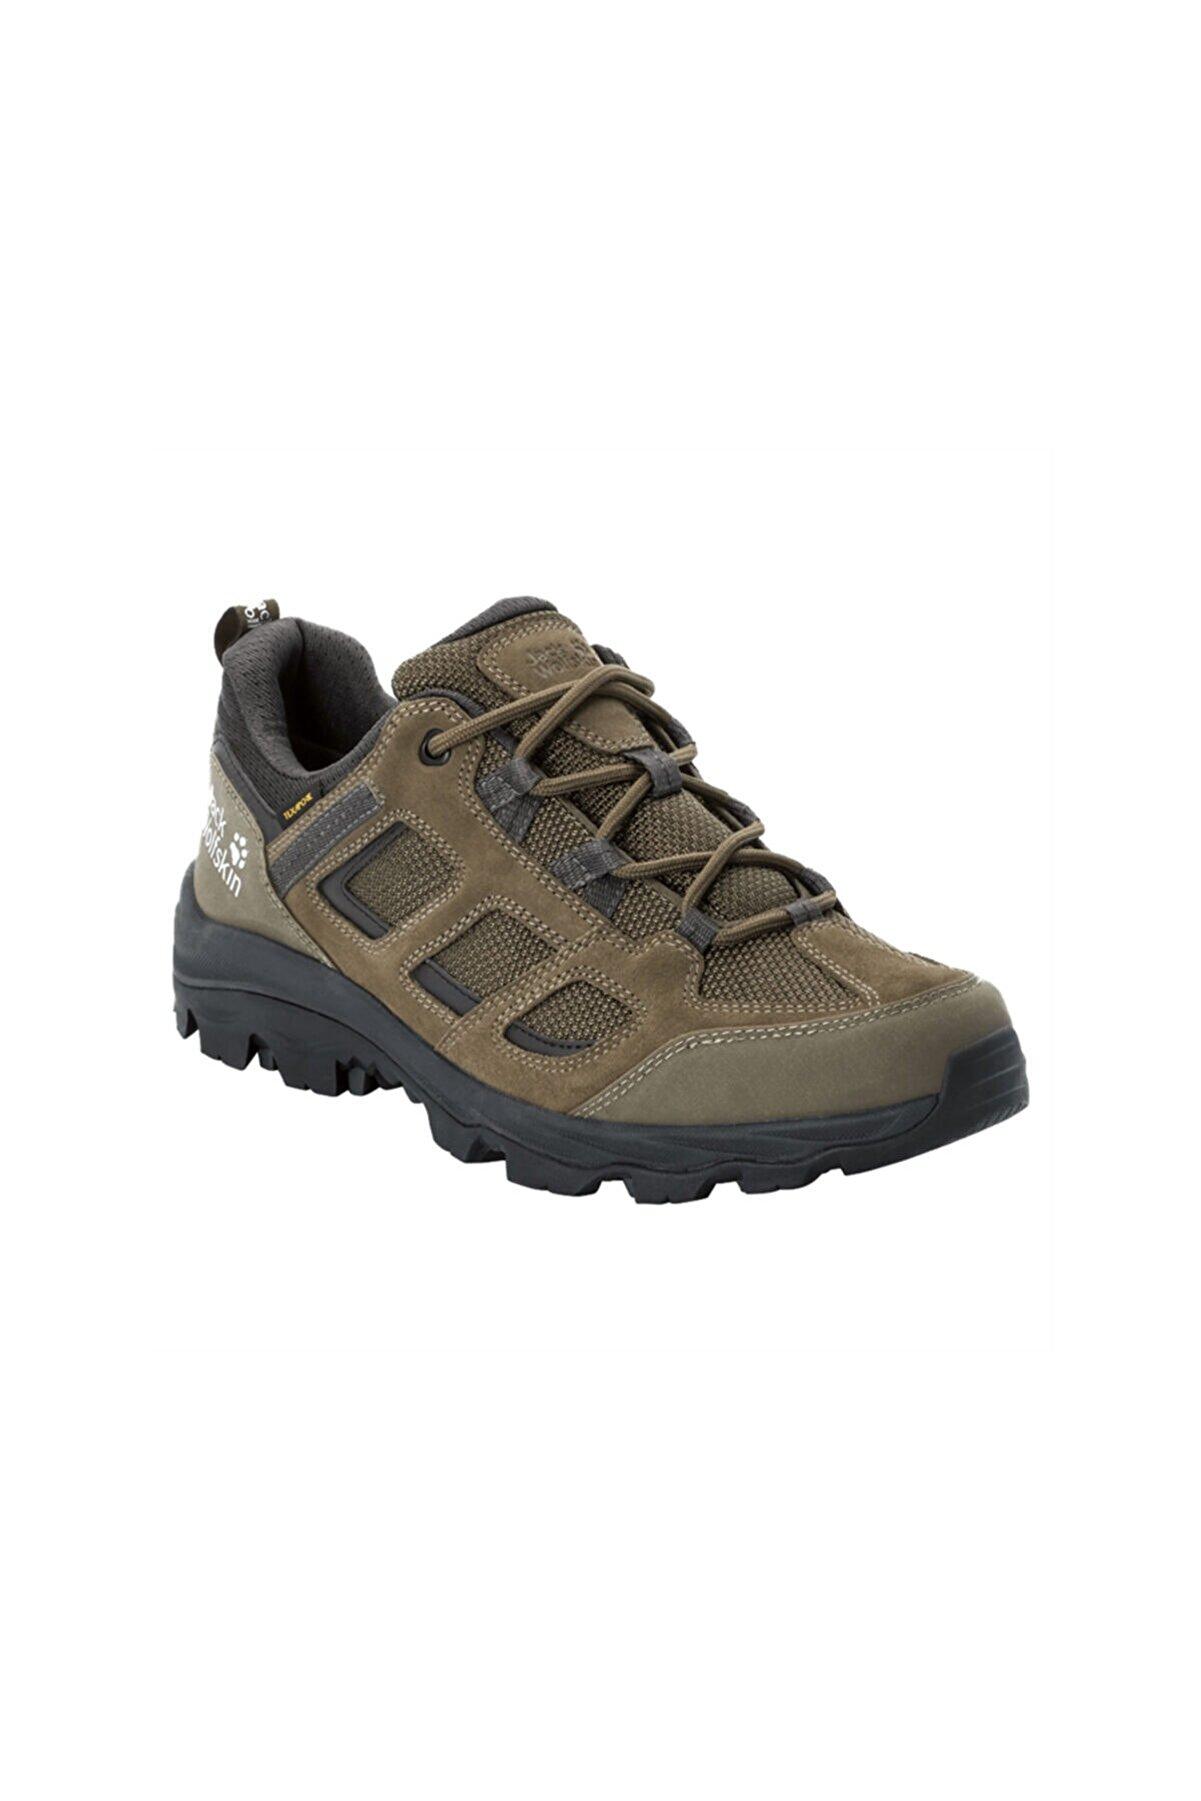 Jack Wolfskin Erkek Outdoor Ayakkabı Vojo 3 Texapore Low 4042441